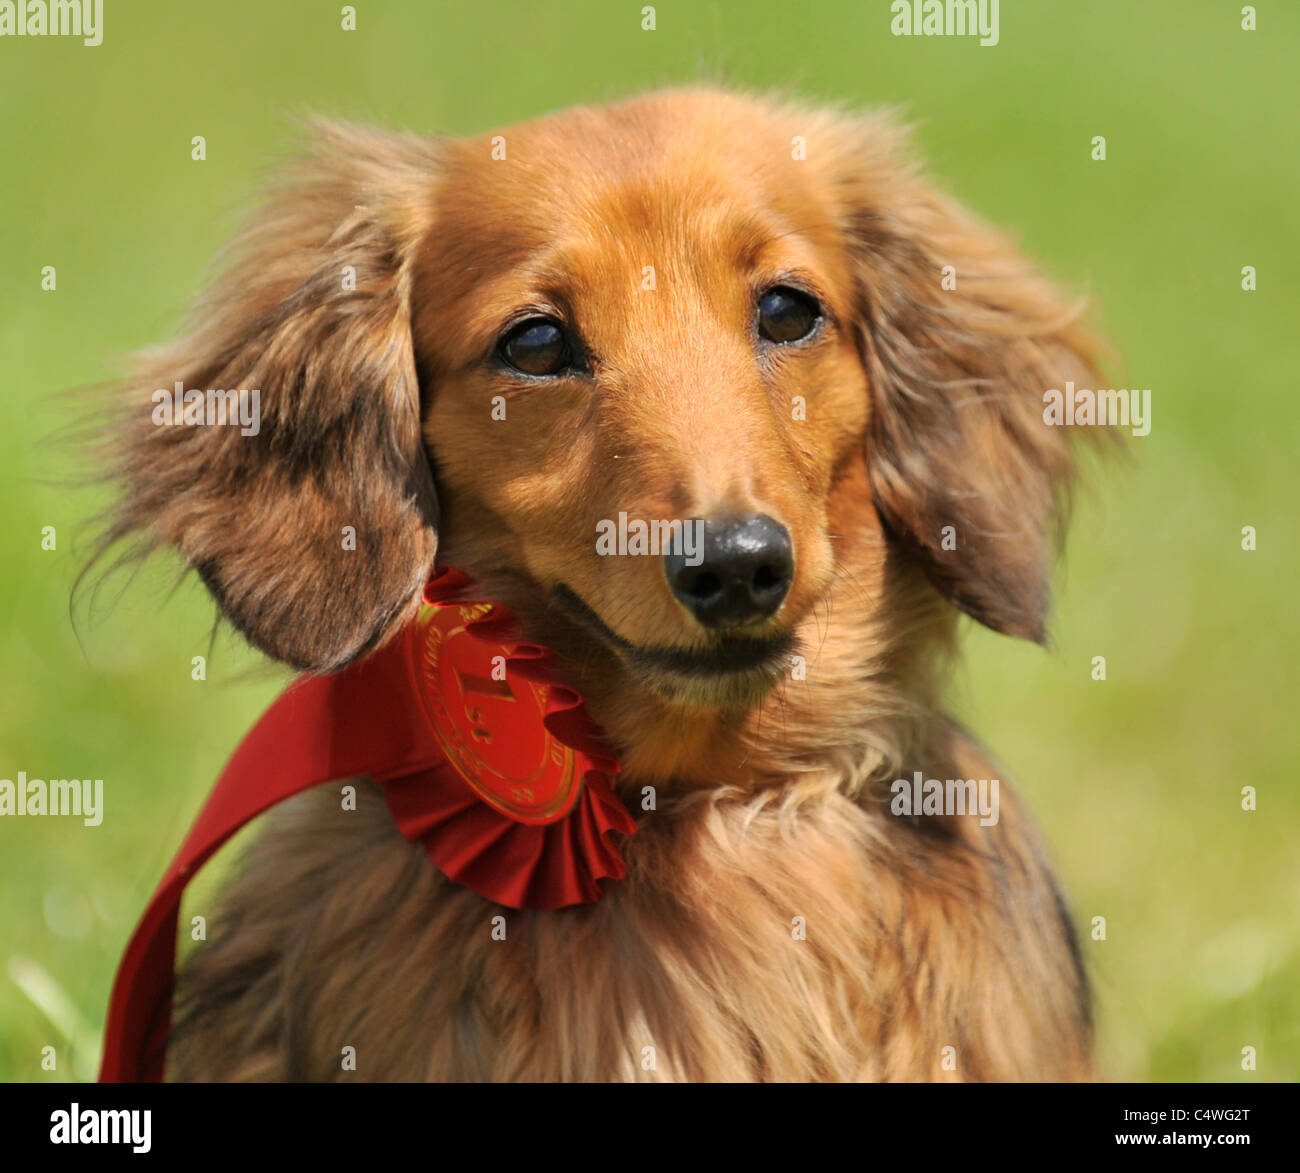 dachshund prize winner at dog show - Stock Image